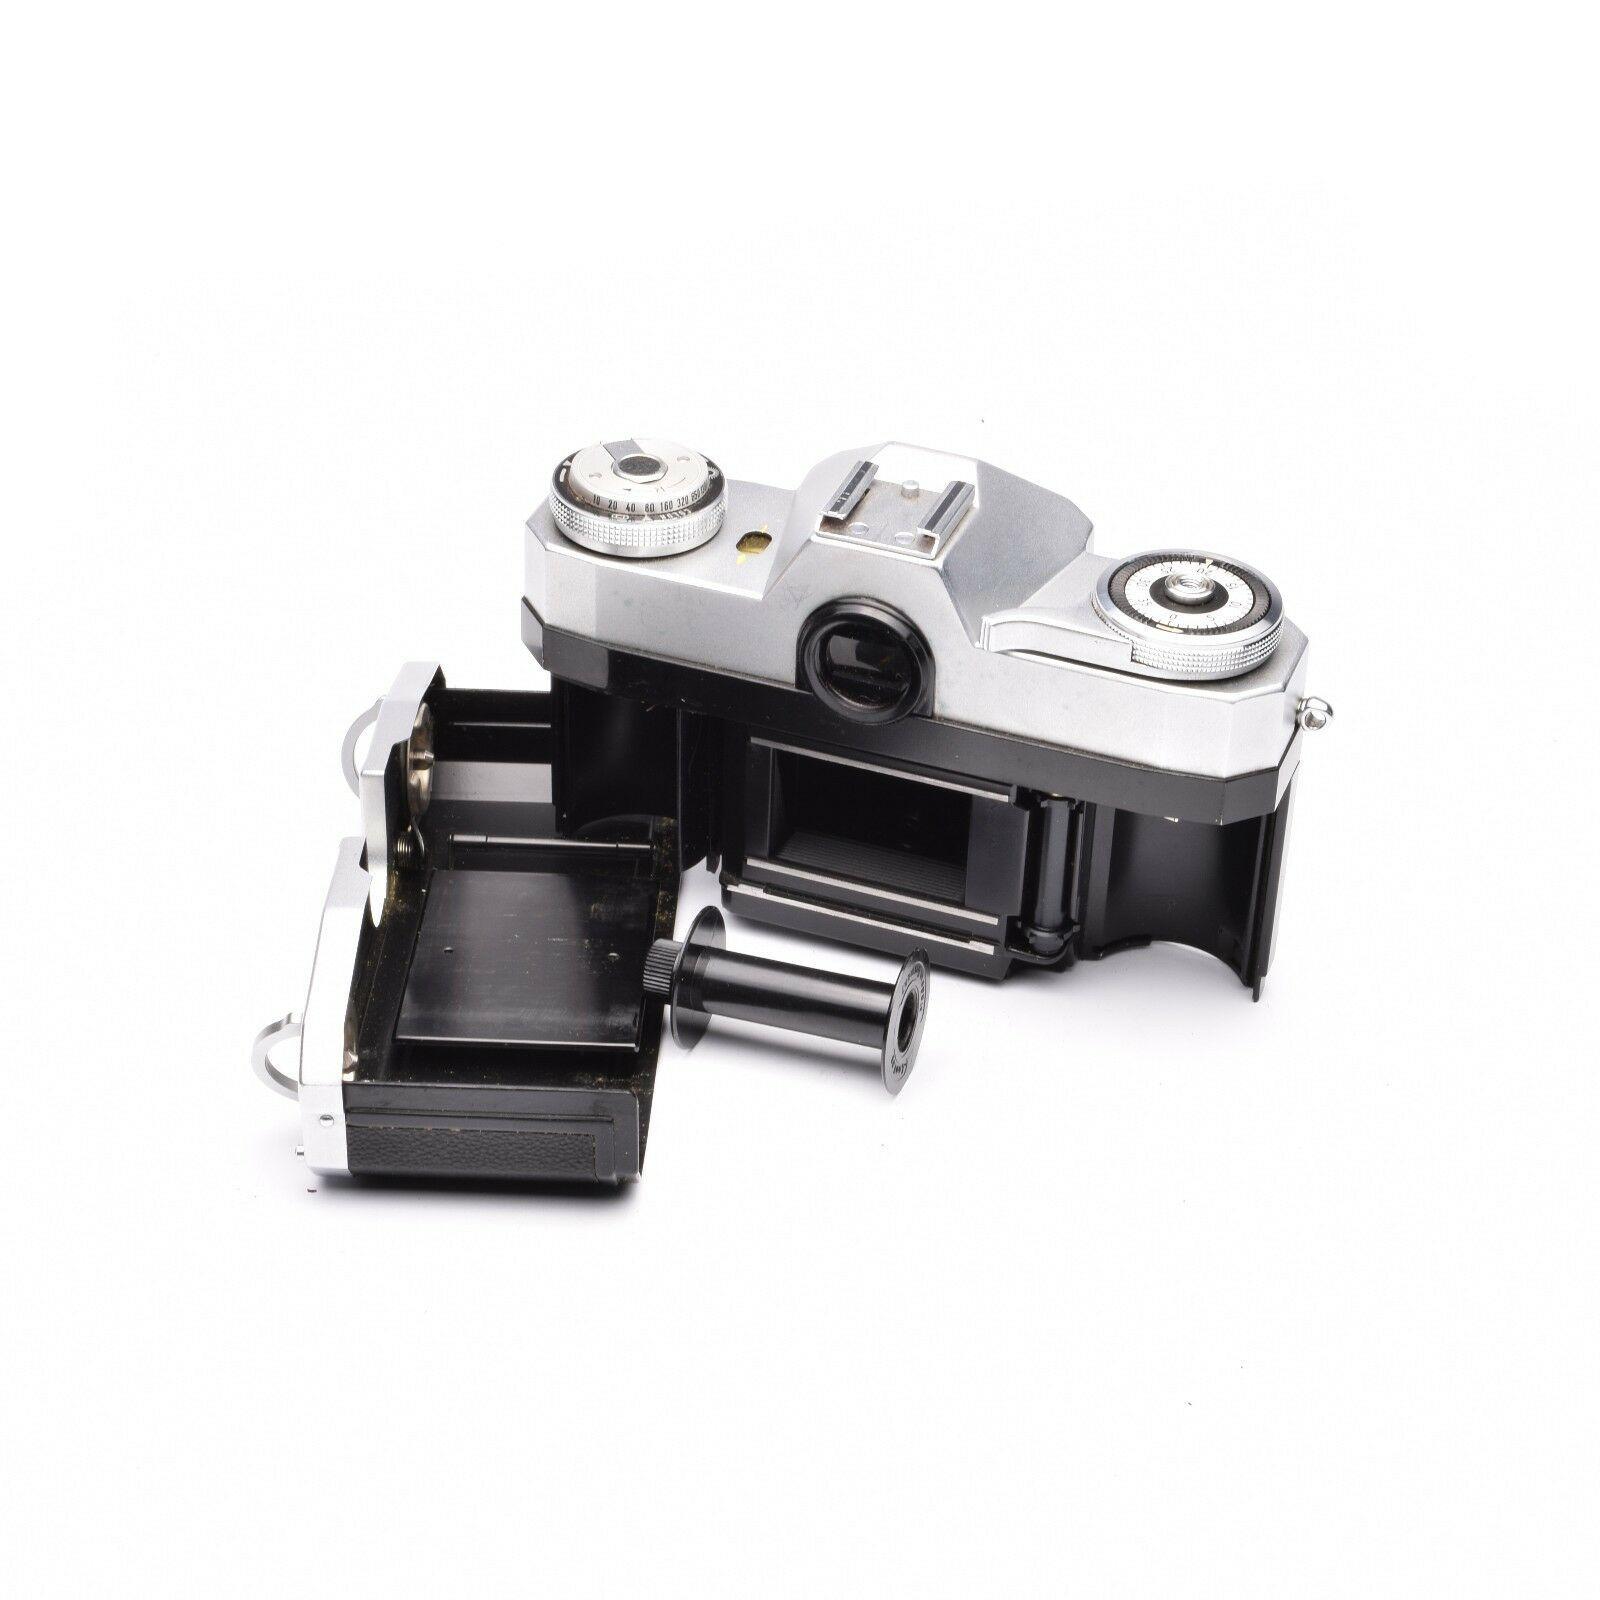 Zeiss Ikon Contaflex Super SLR 35mm Camera with TESSAR 50mm f/2.8 Lens